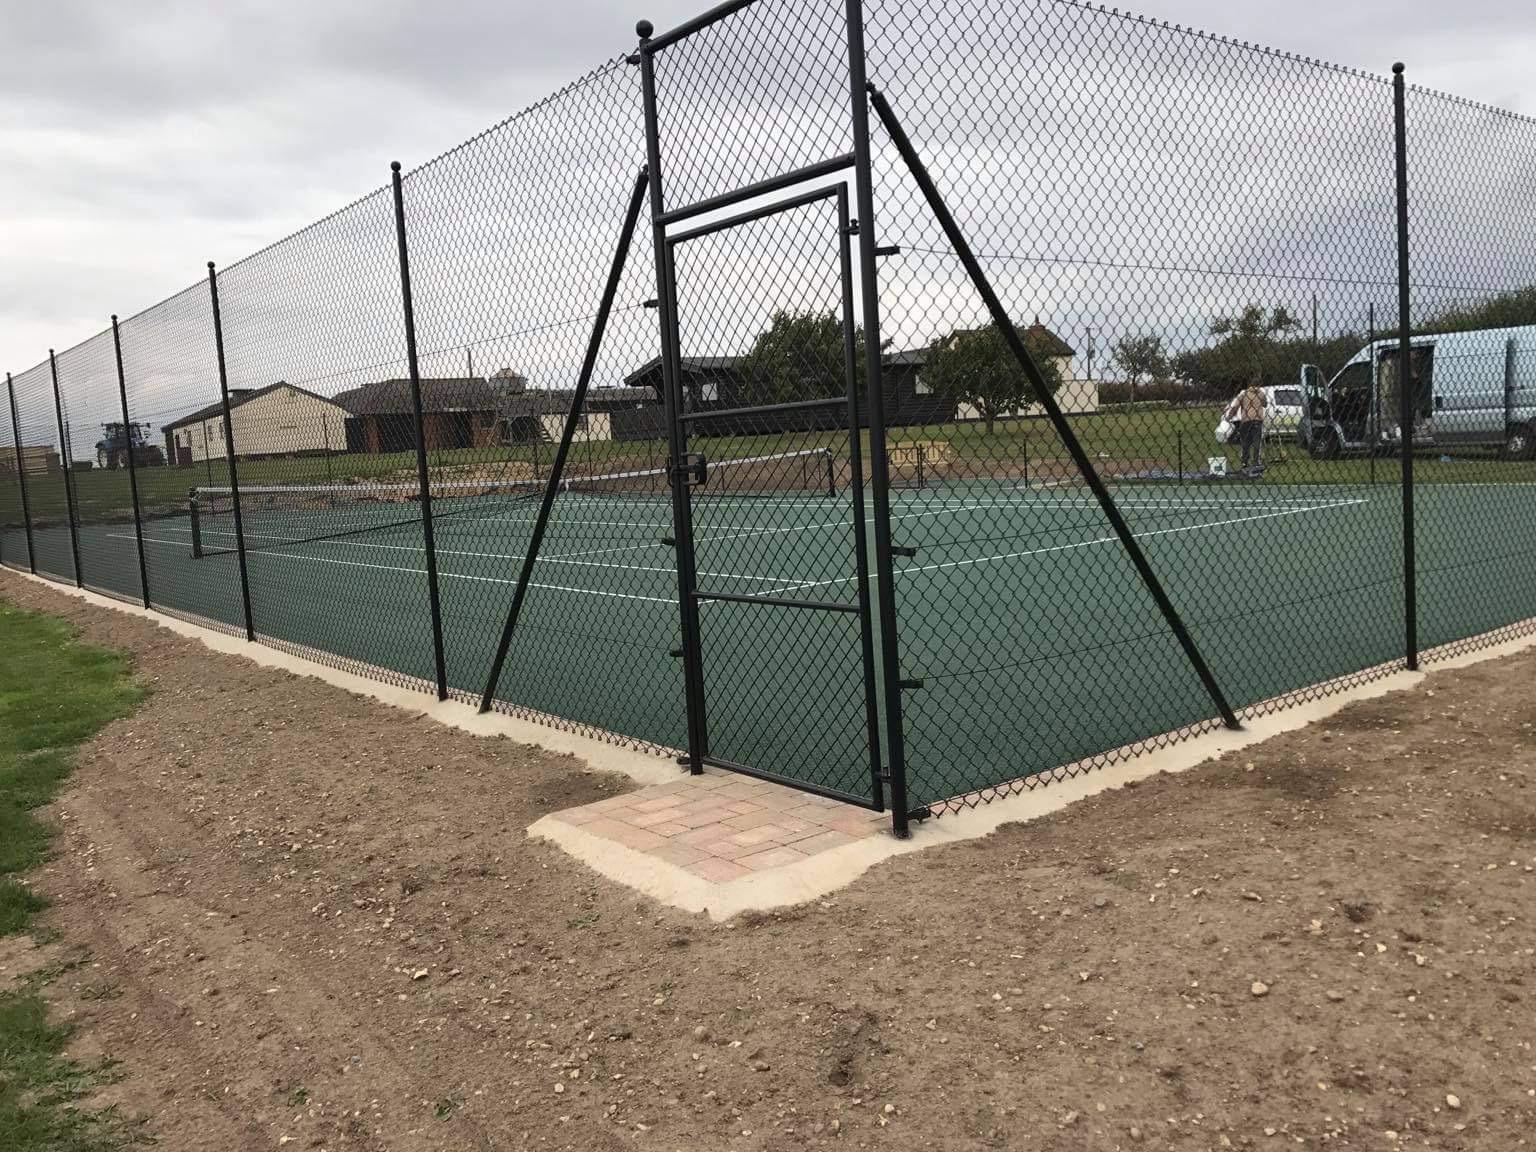 New Court 2